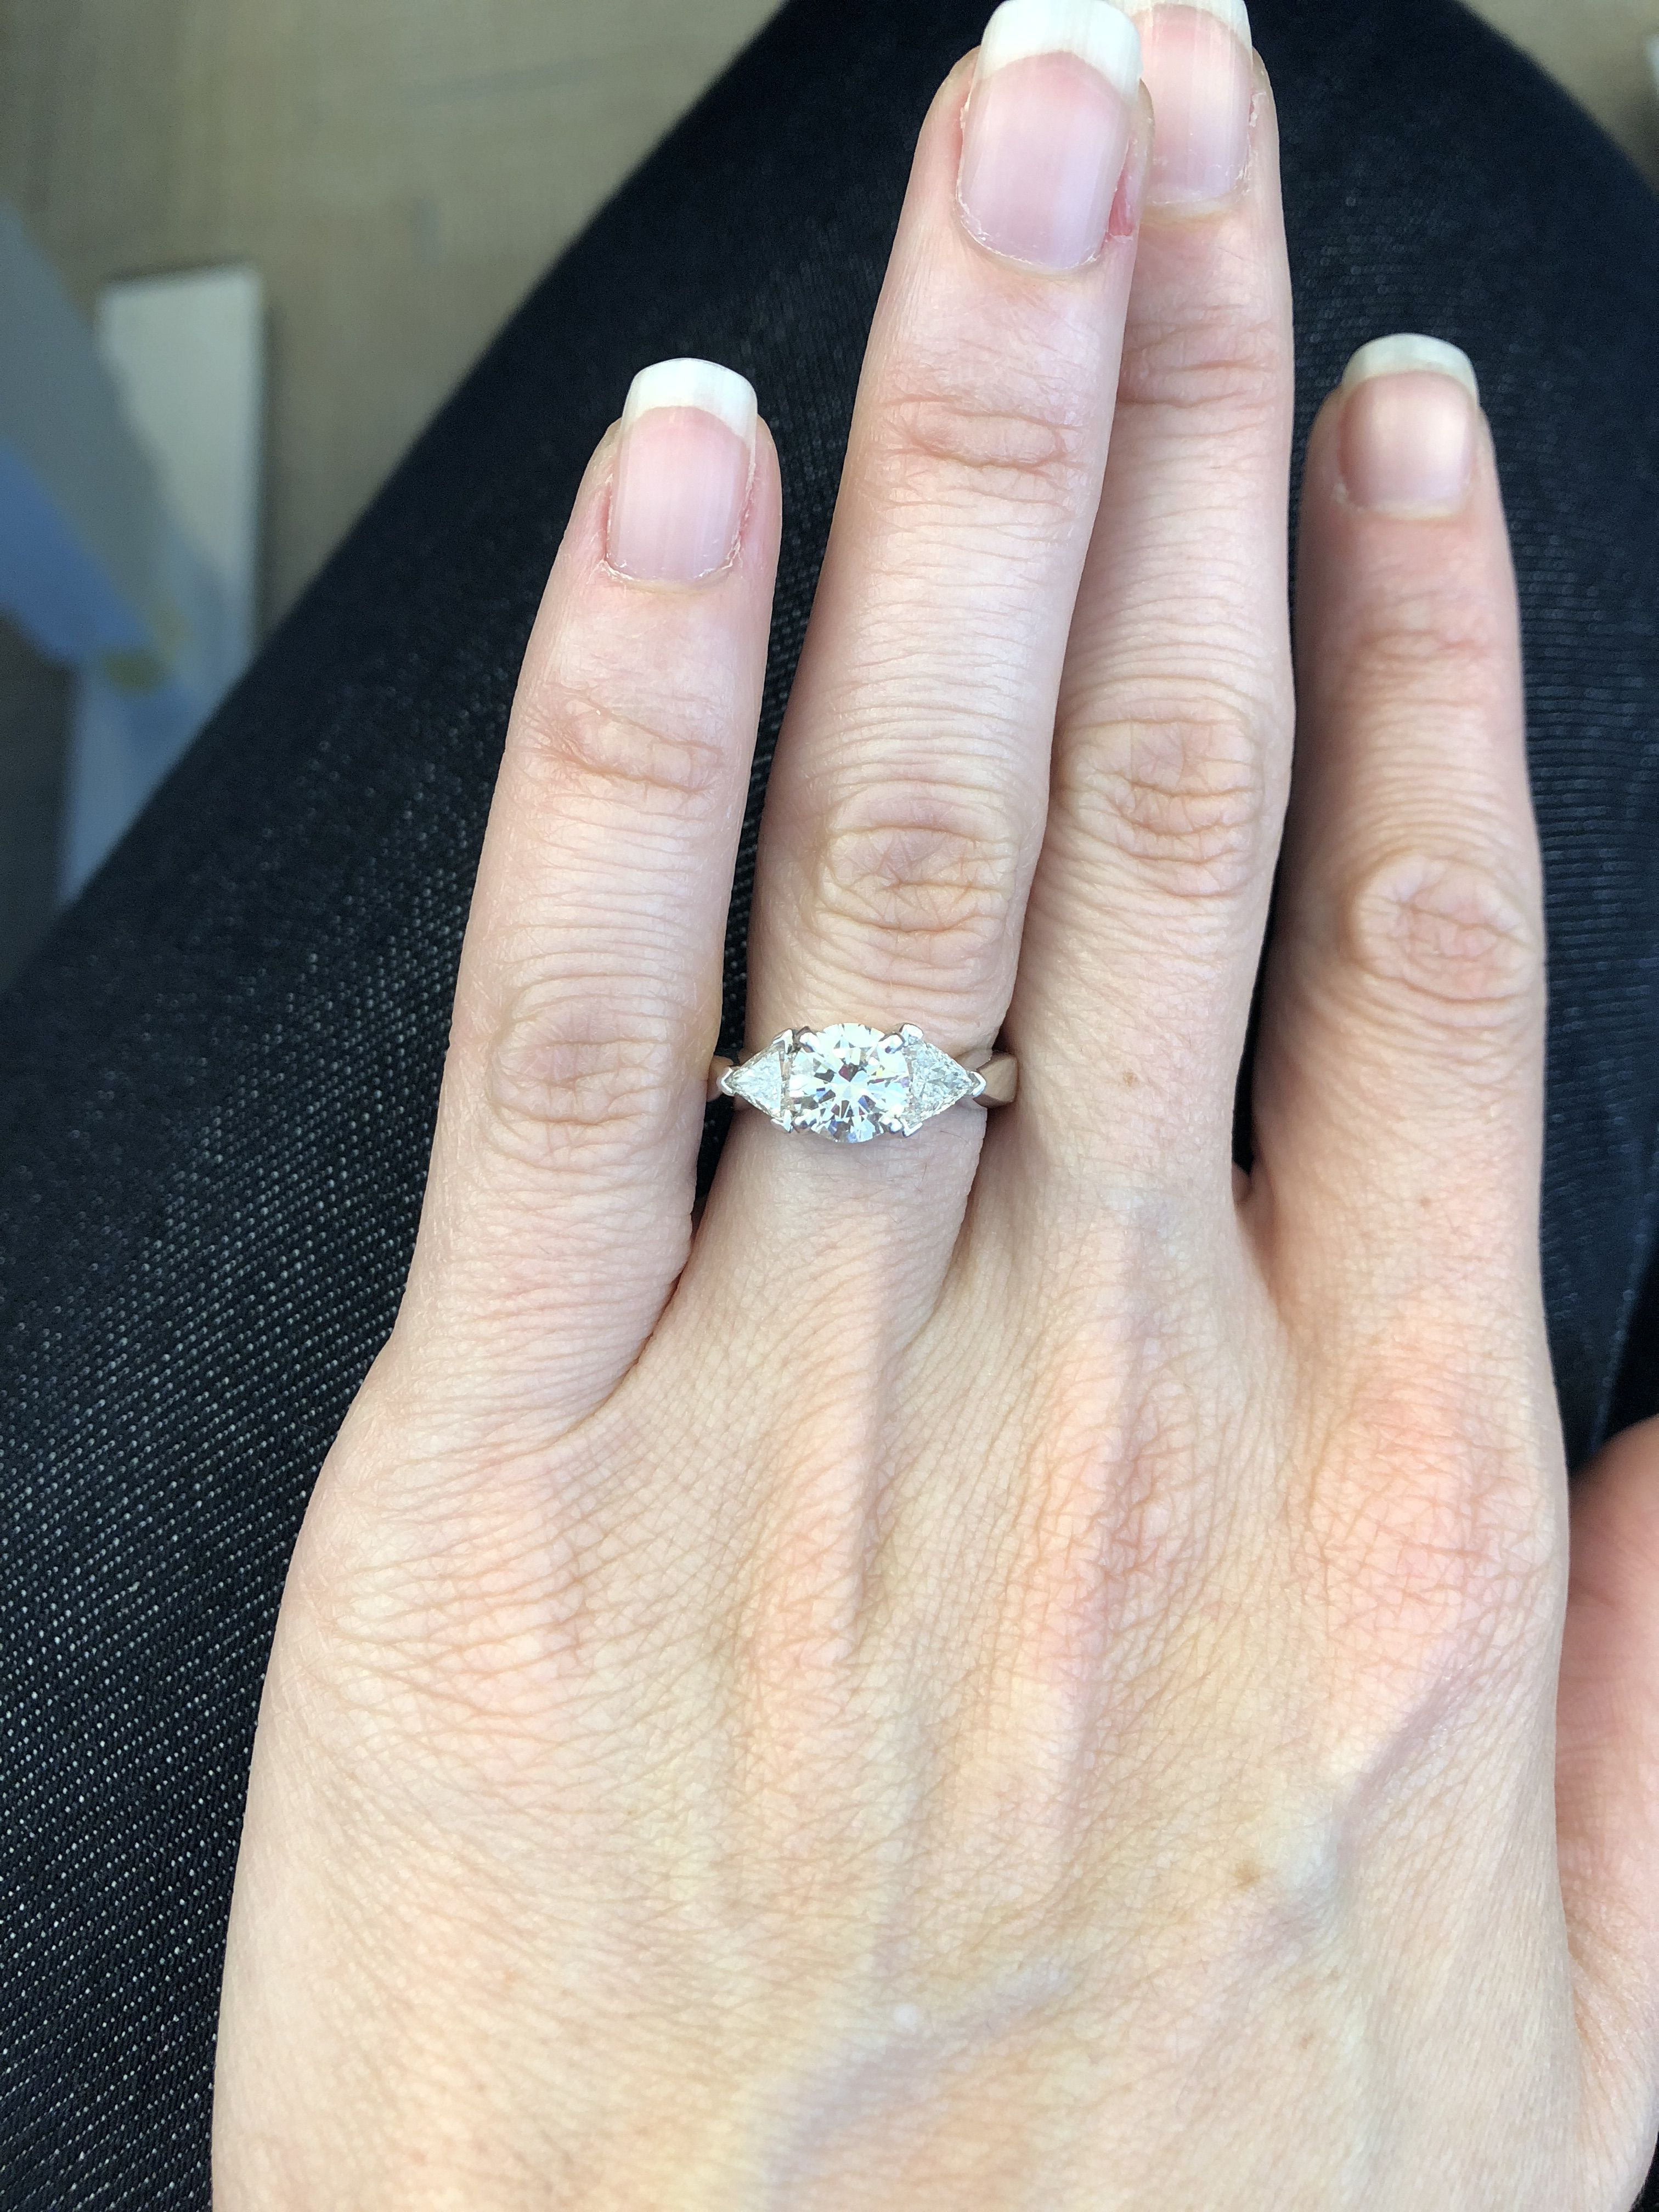 My Dream Ring Dream Ring Fine Ring Rings